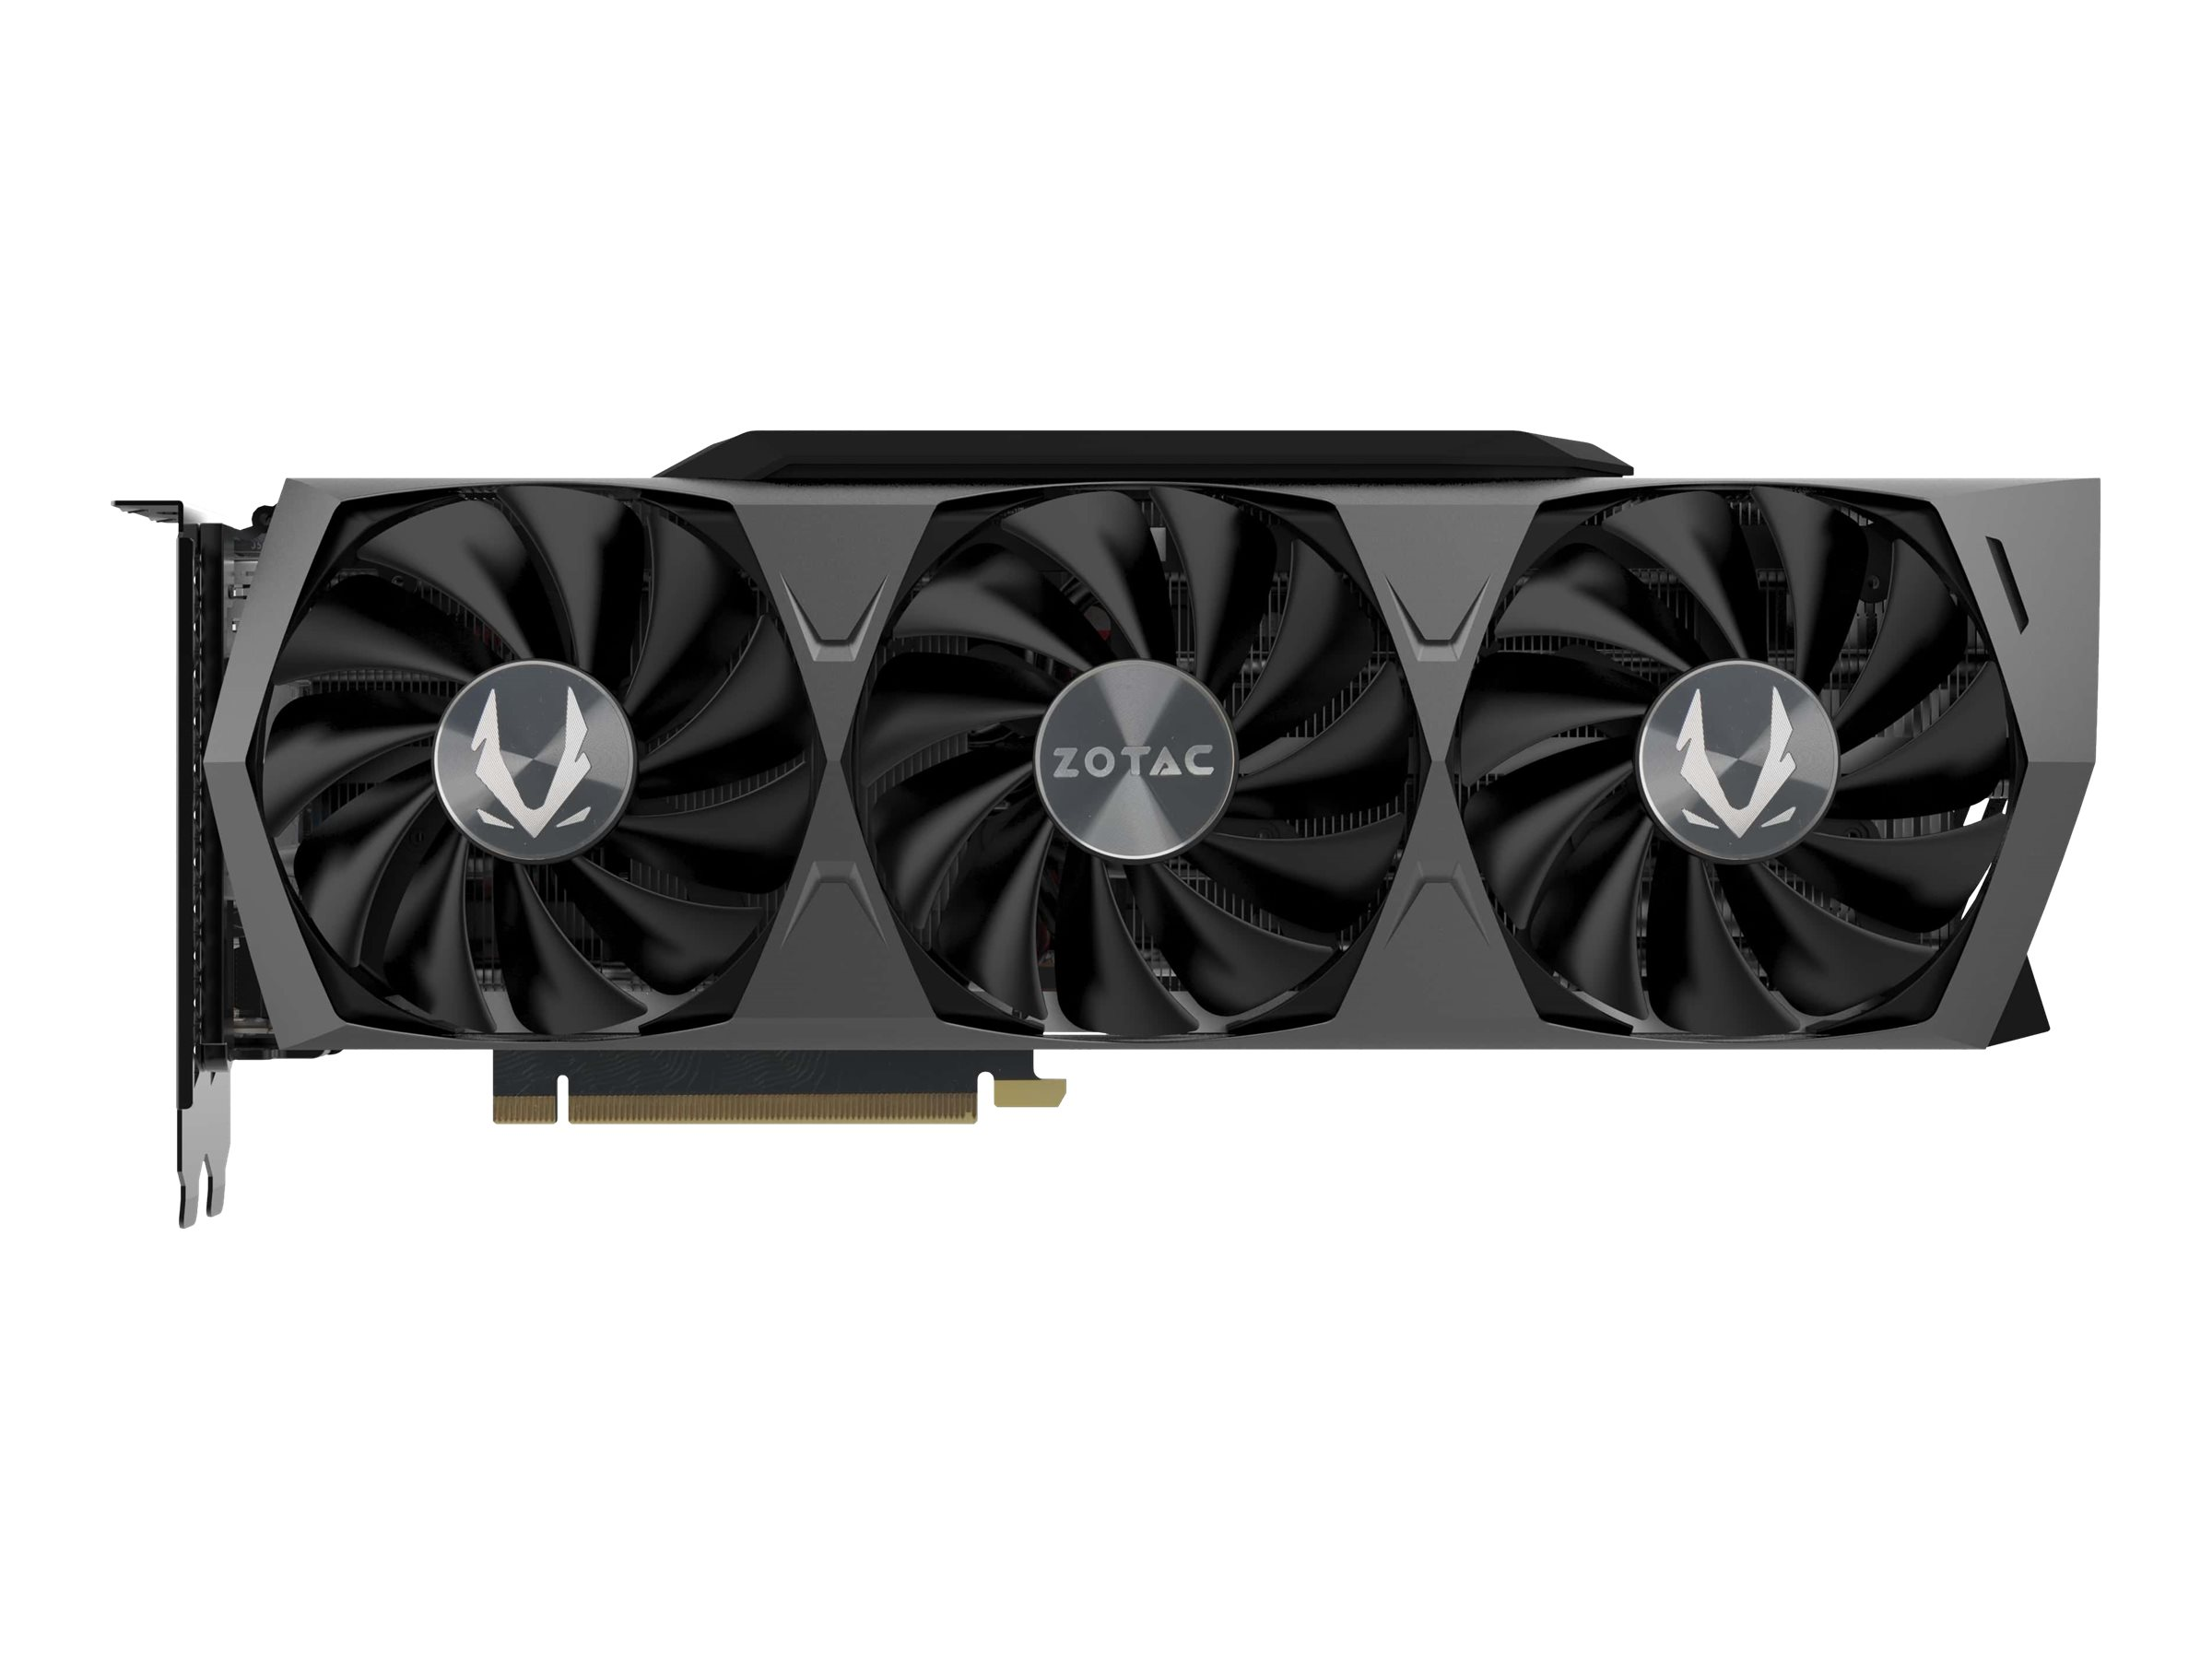 ZOTAC GAMING GeForce RTX 3080 Ti Trinity - Grafikkarten